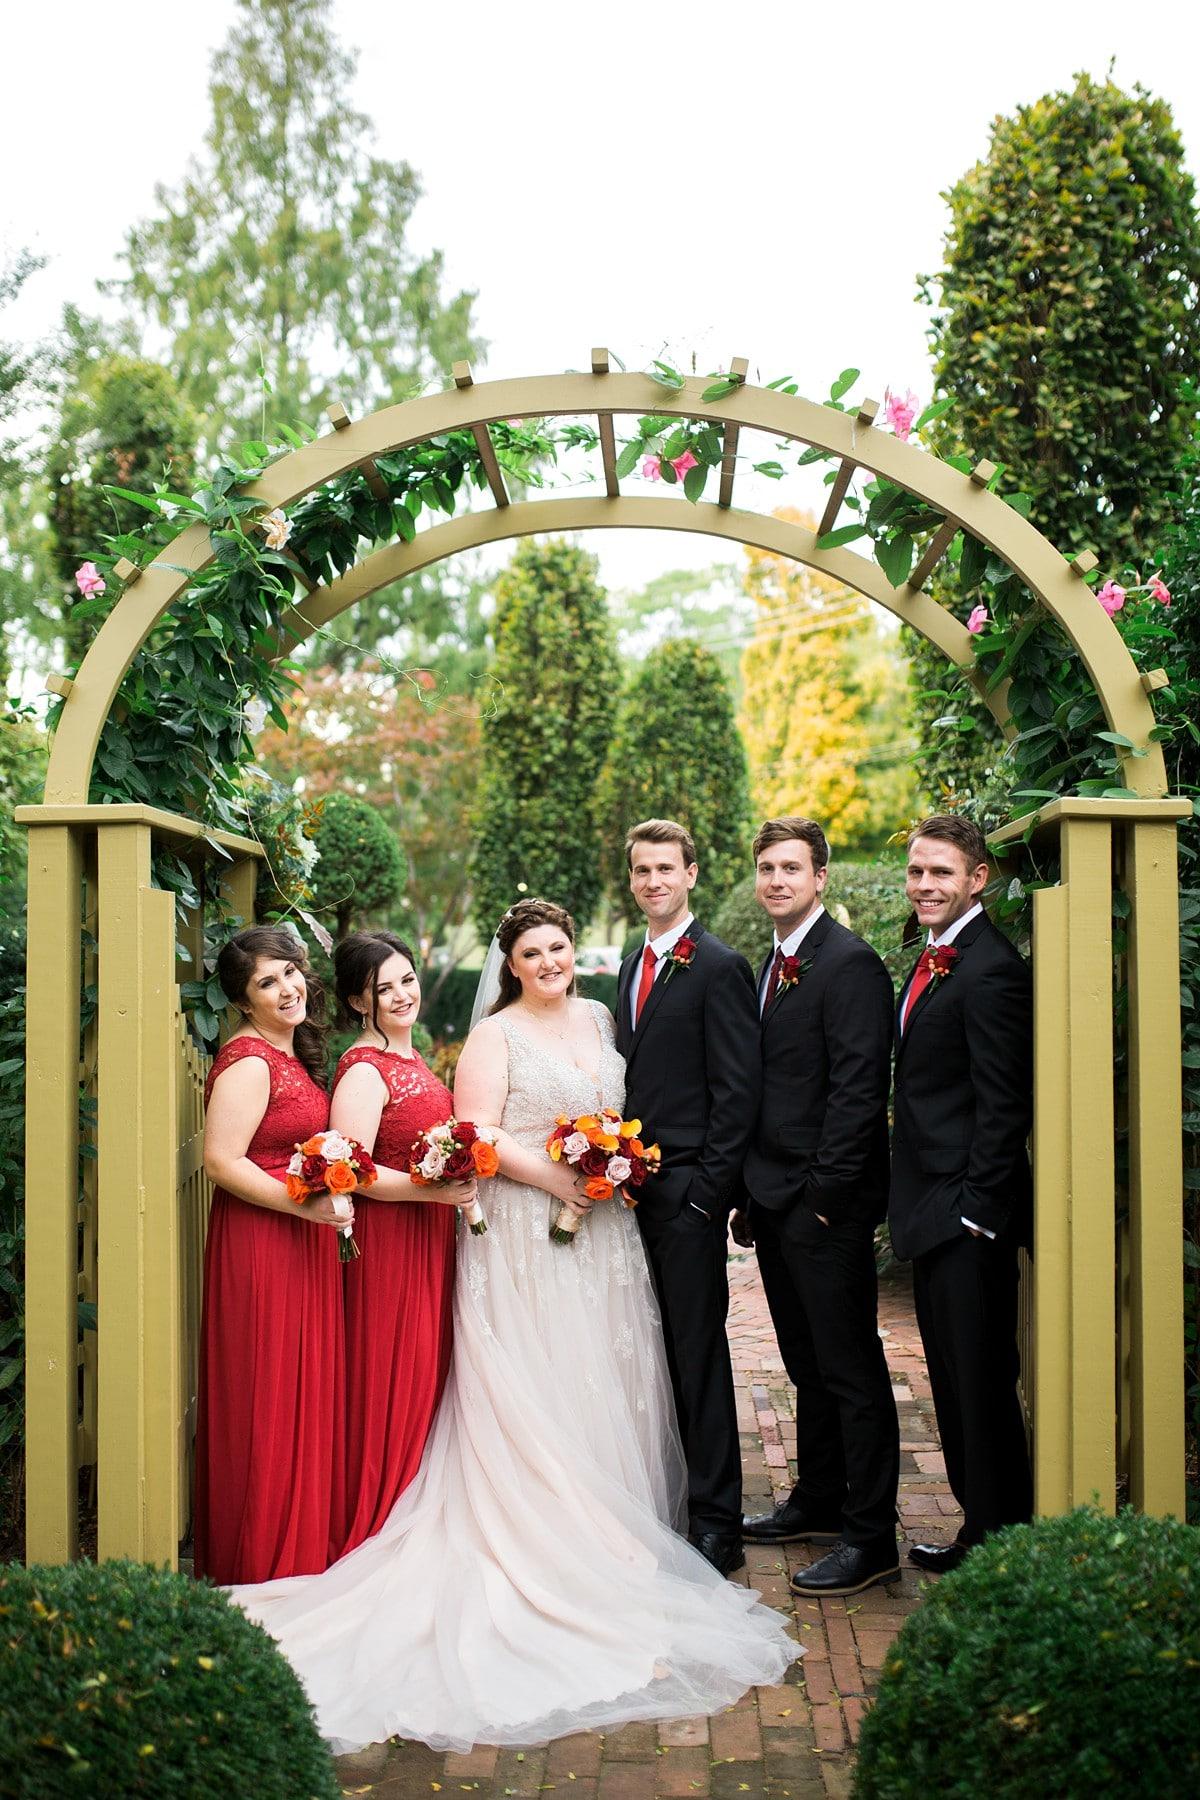 Wedding Party Portrait, Wedding Photography Poses, St. Louis Wedding Photographer